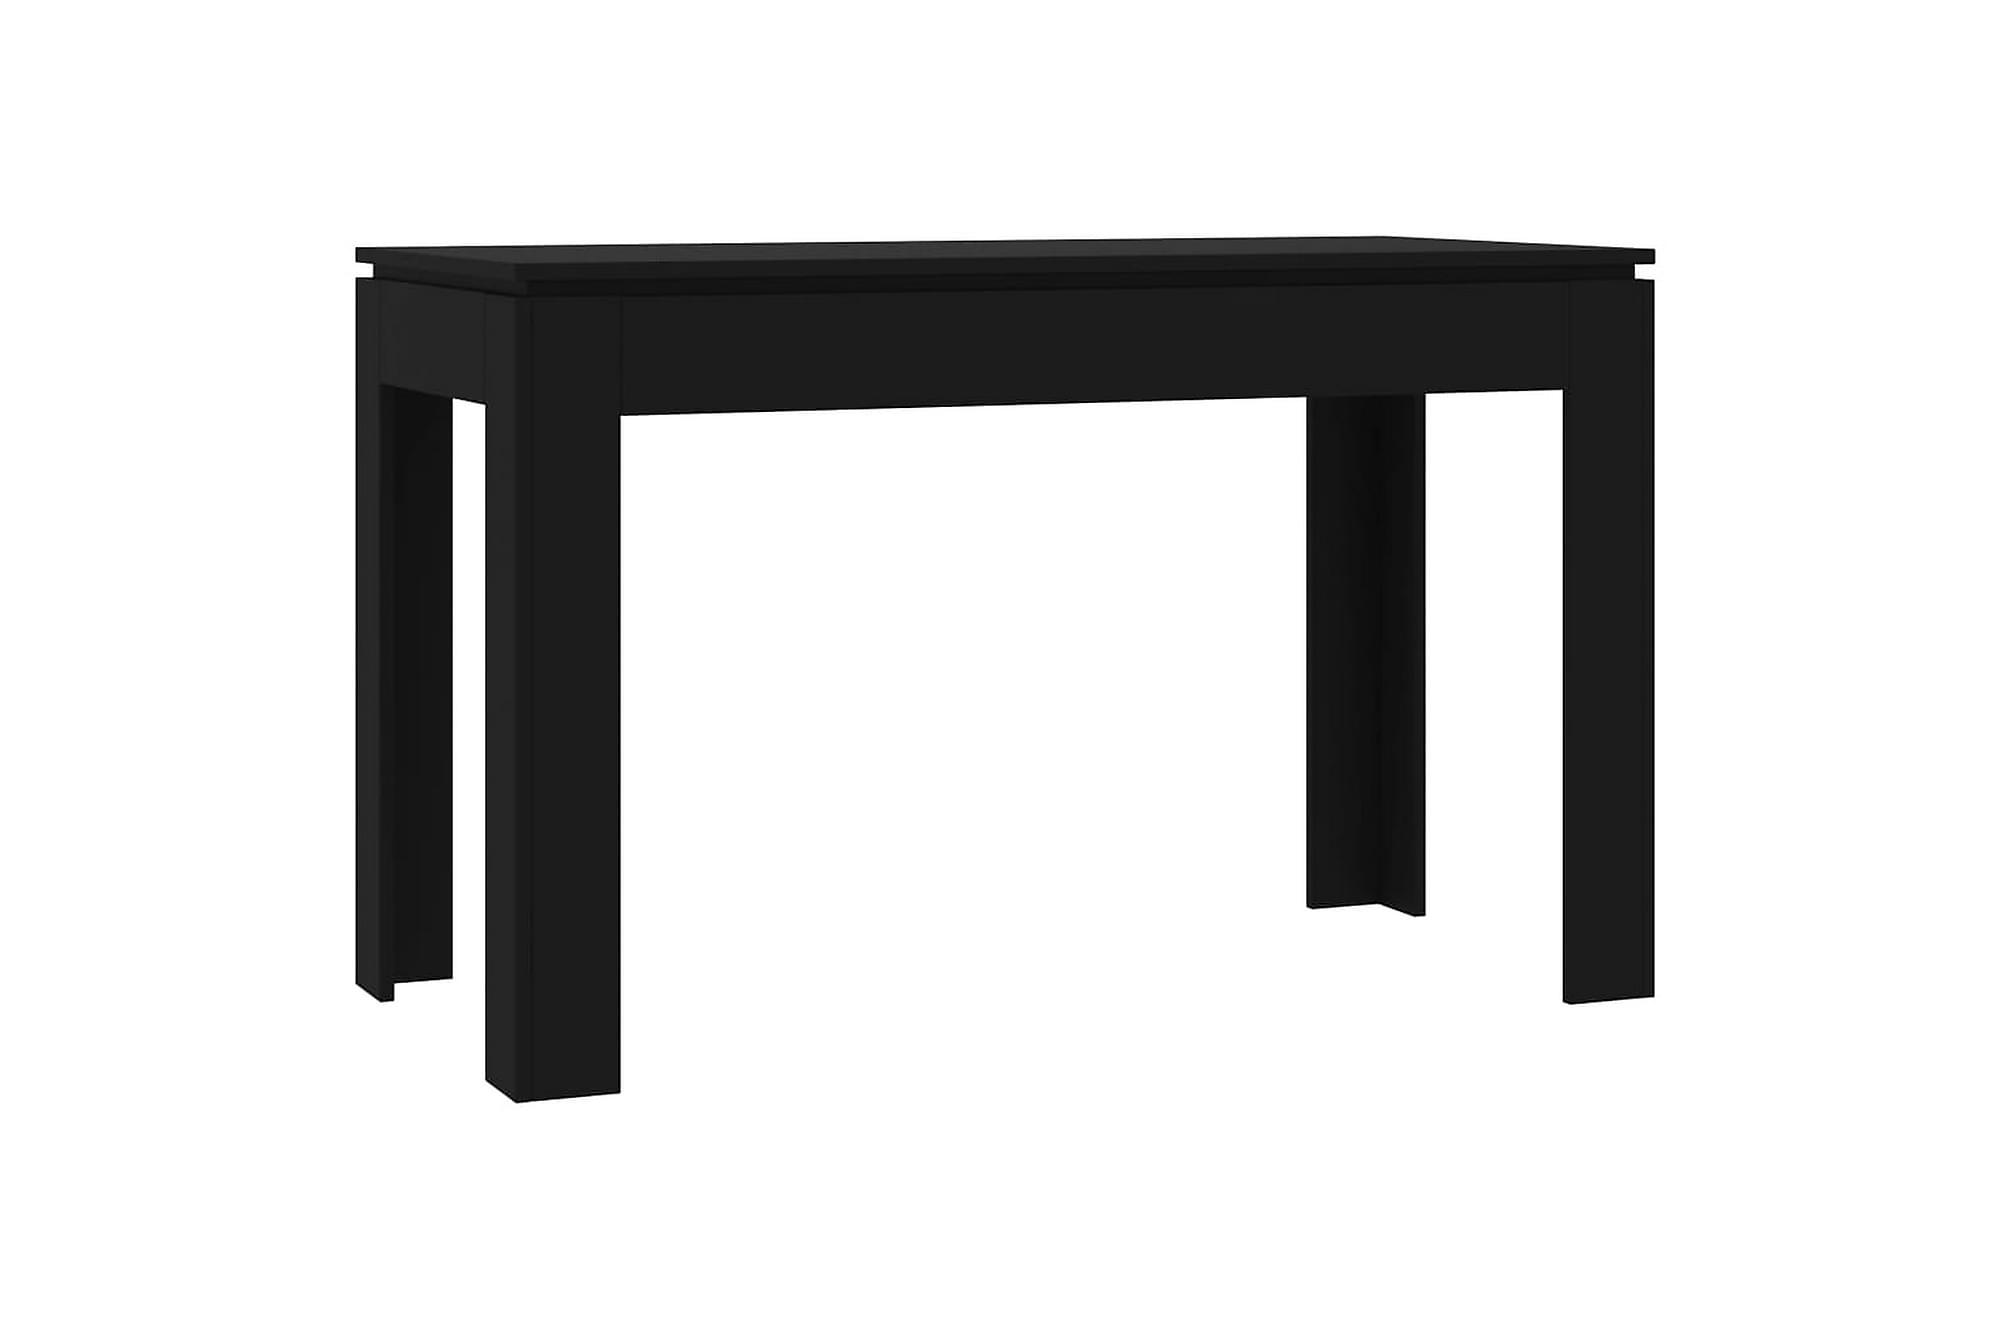 Matbord svart 120x60x76 cm spånskiva